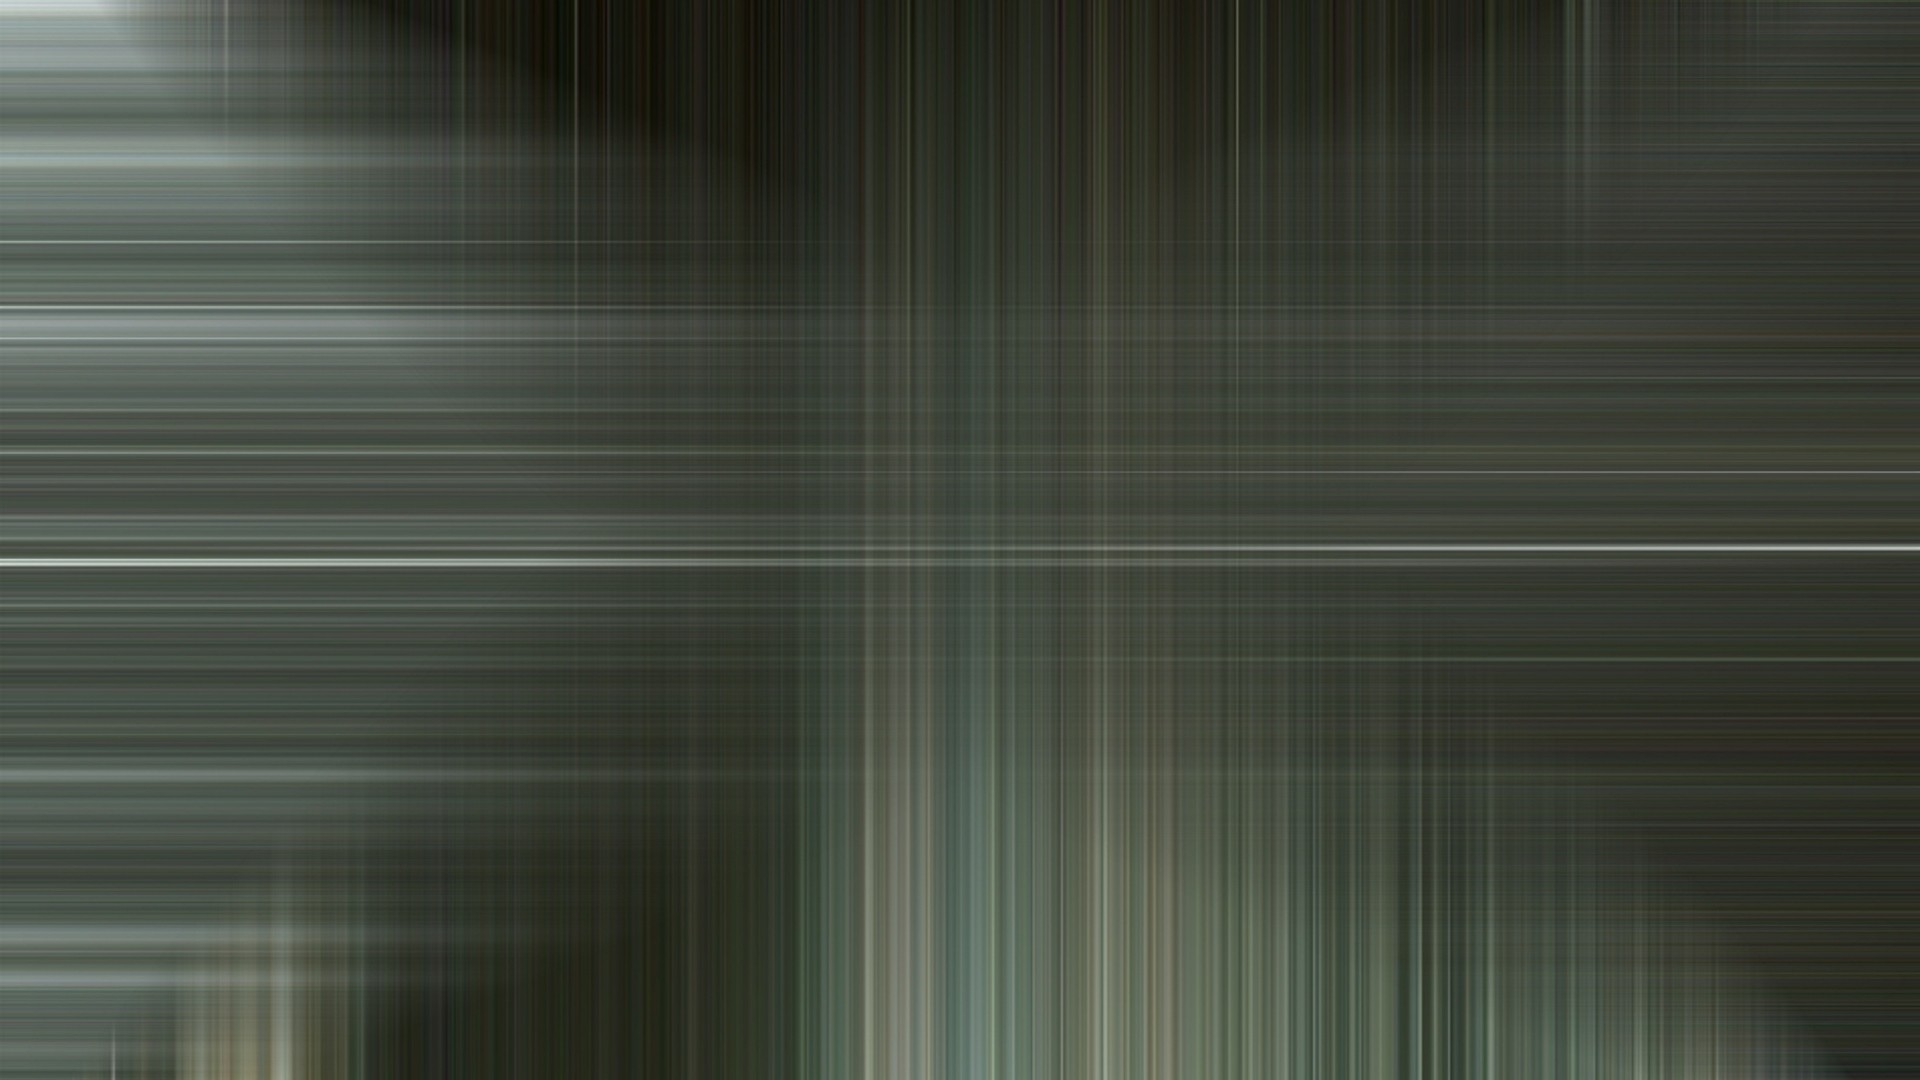 1080p Vertical Wallpaper (83+ Images